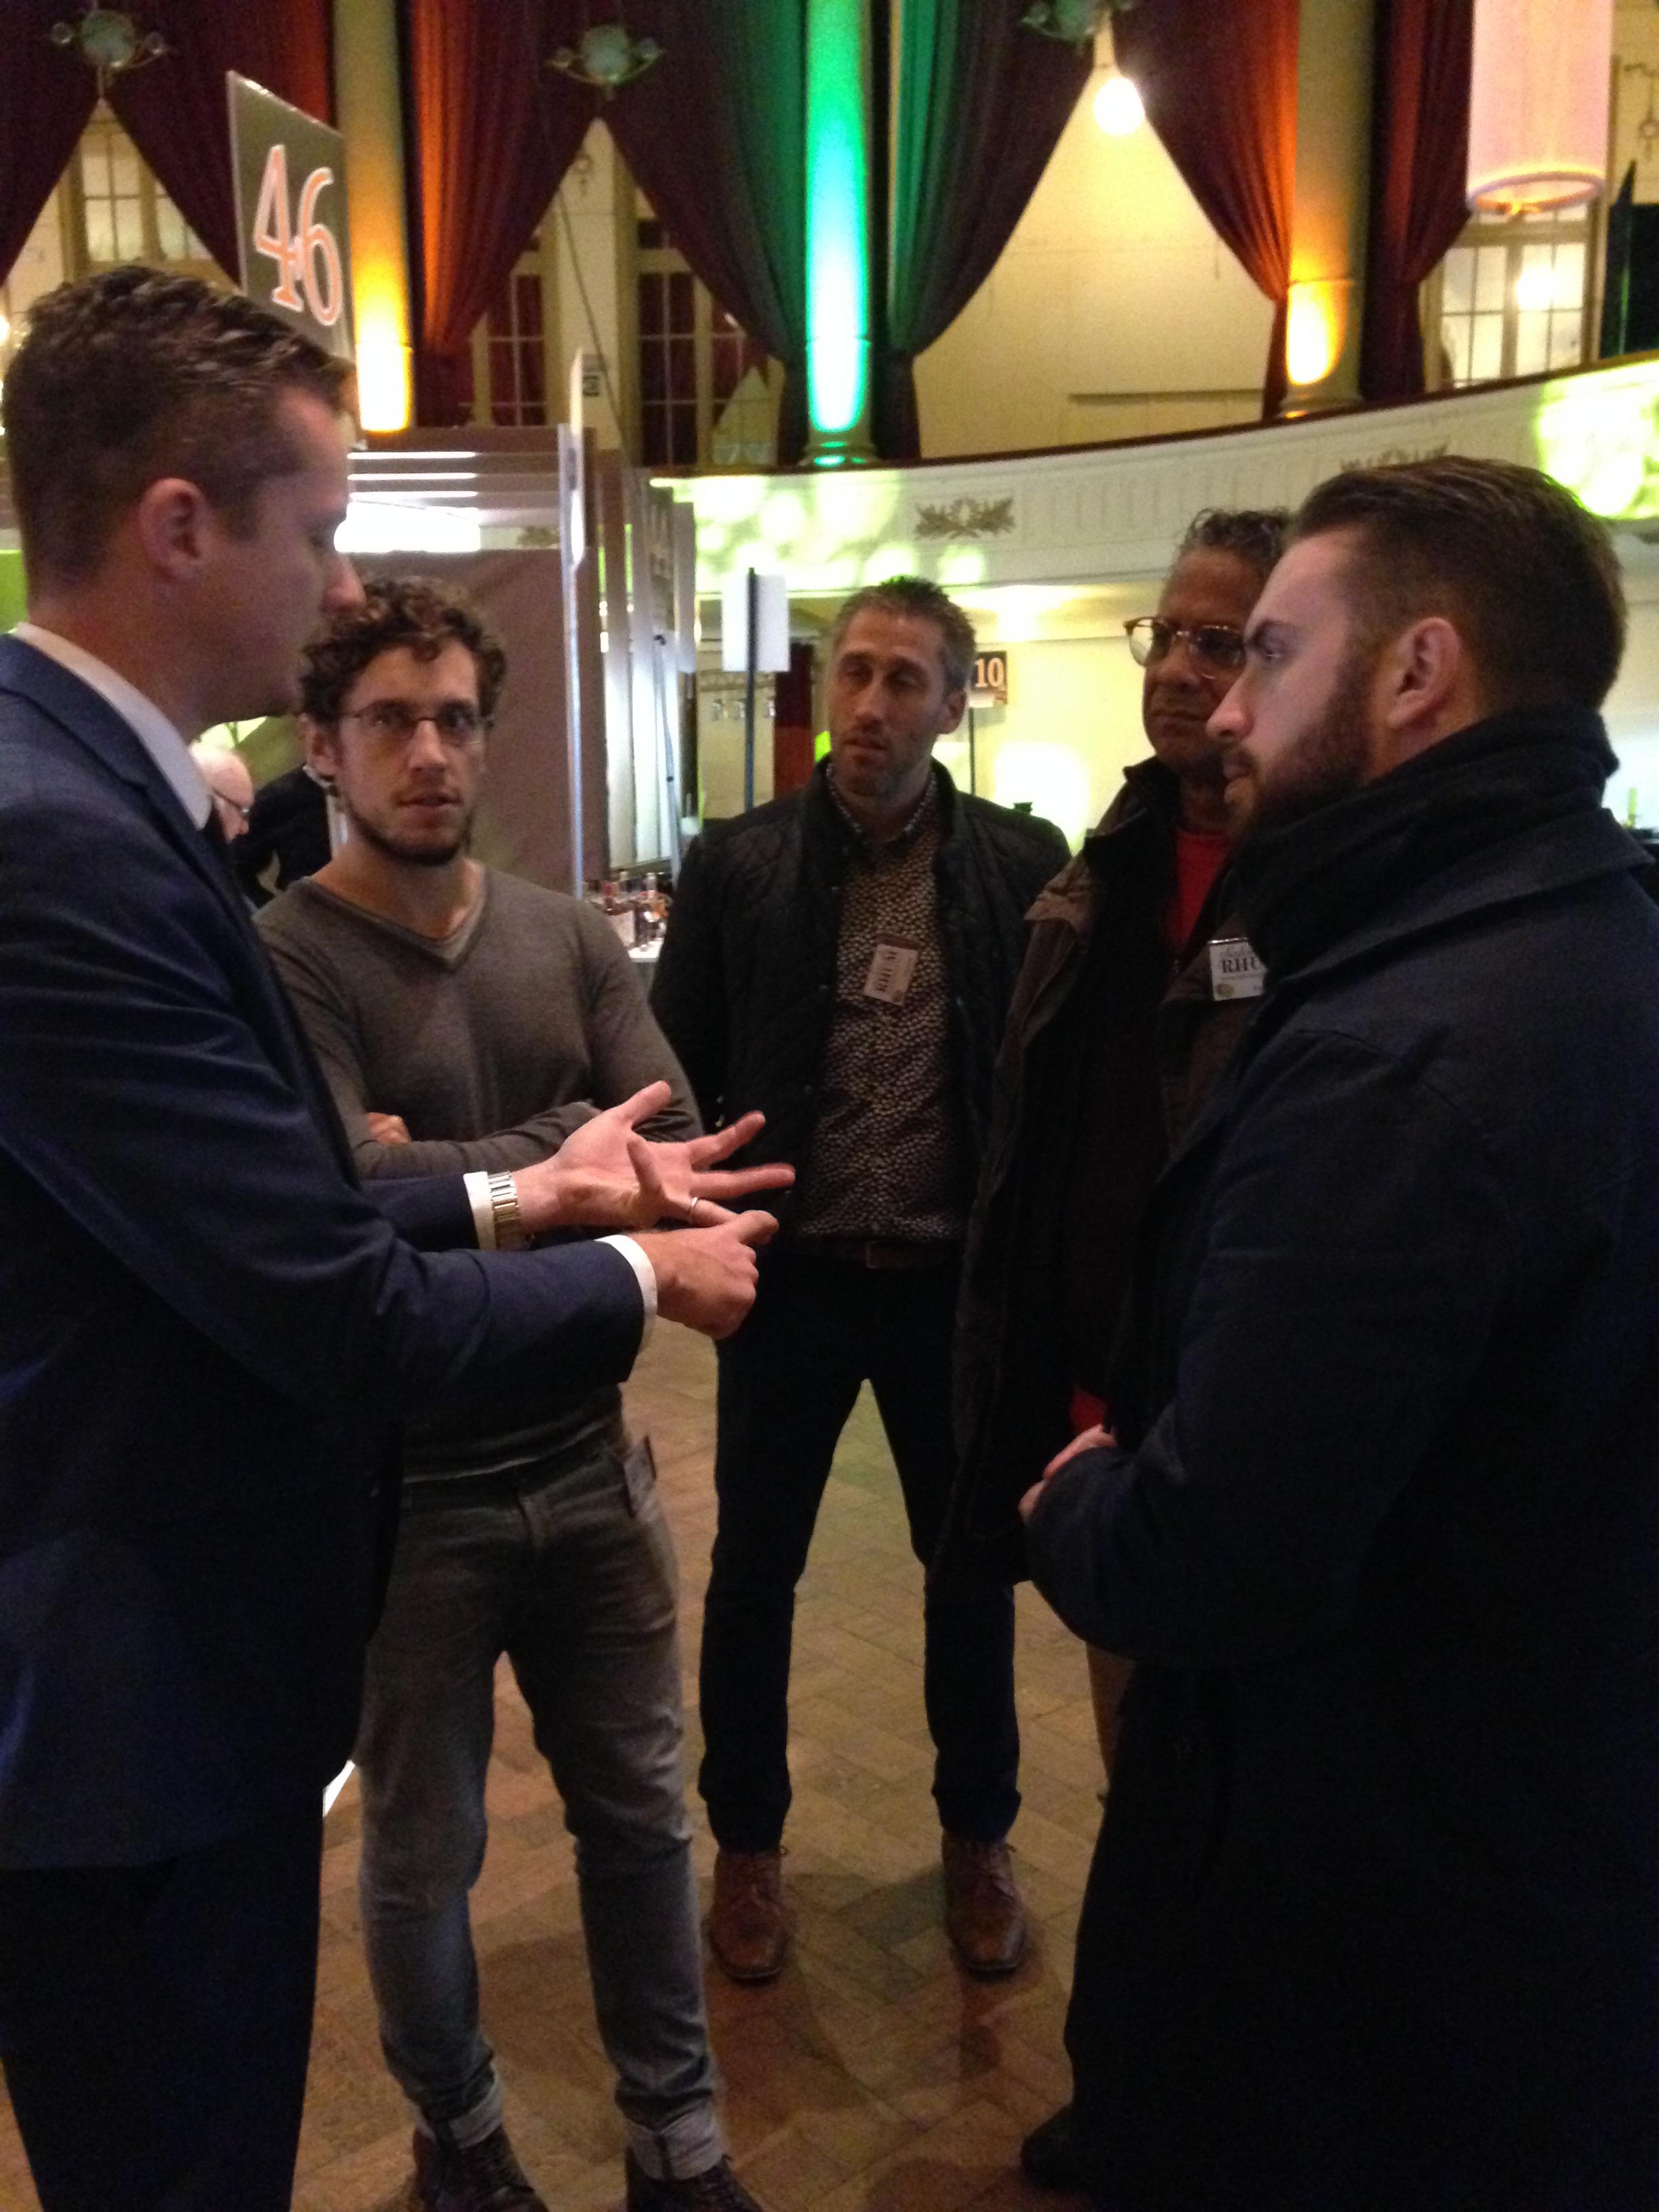 Benoit Bail, Les Ti'Rhum de Ced, François Longueteau & Jerry Jitani, Spa October 2016